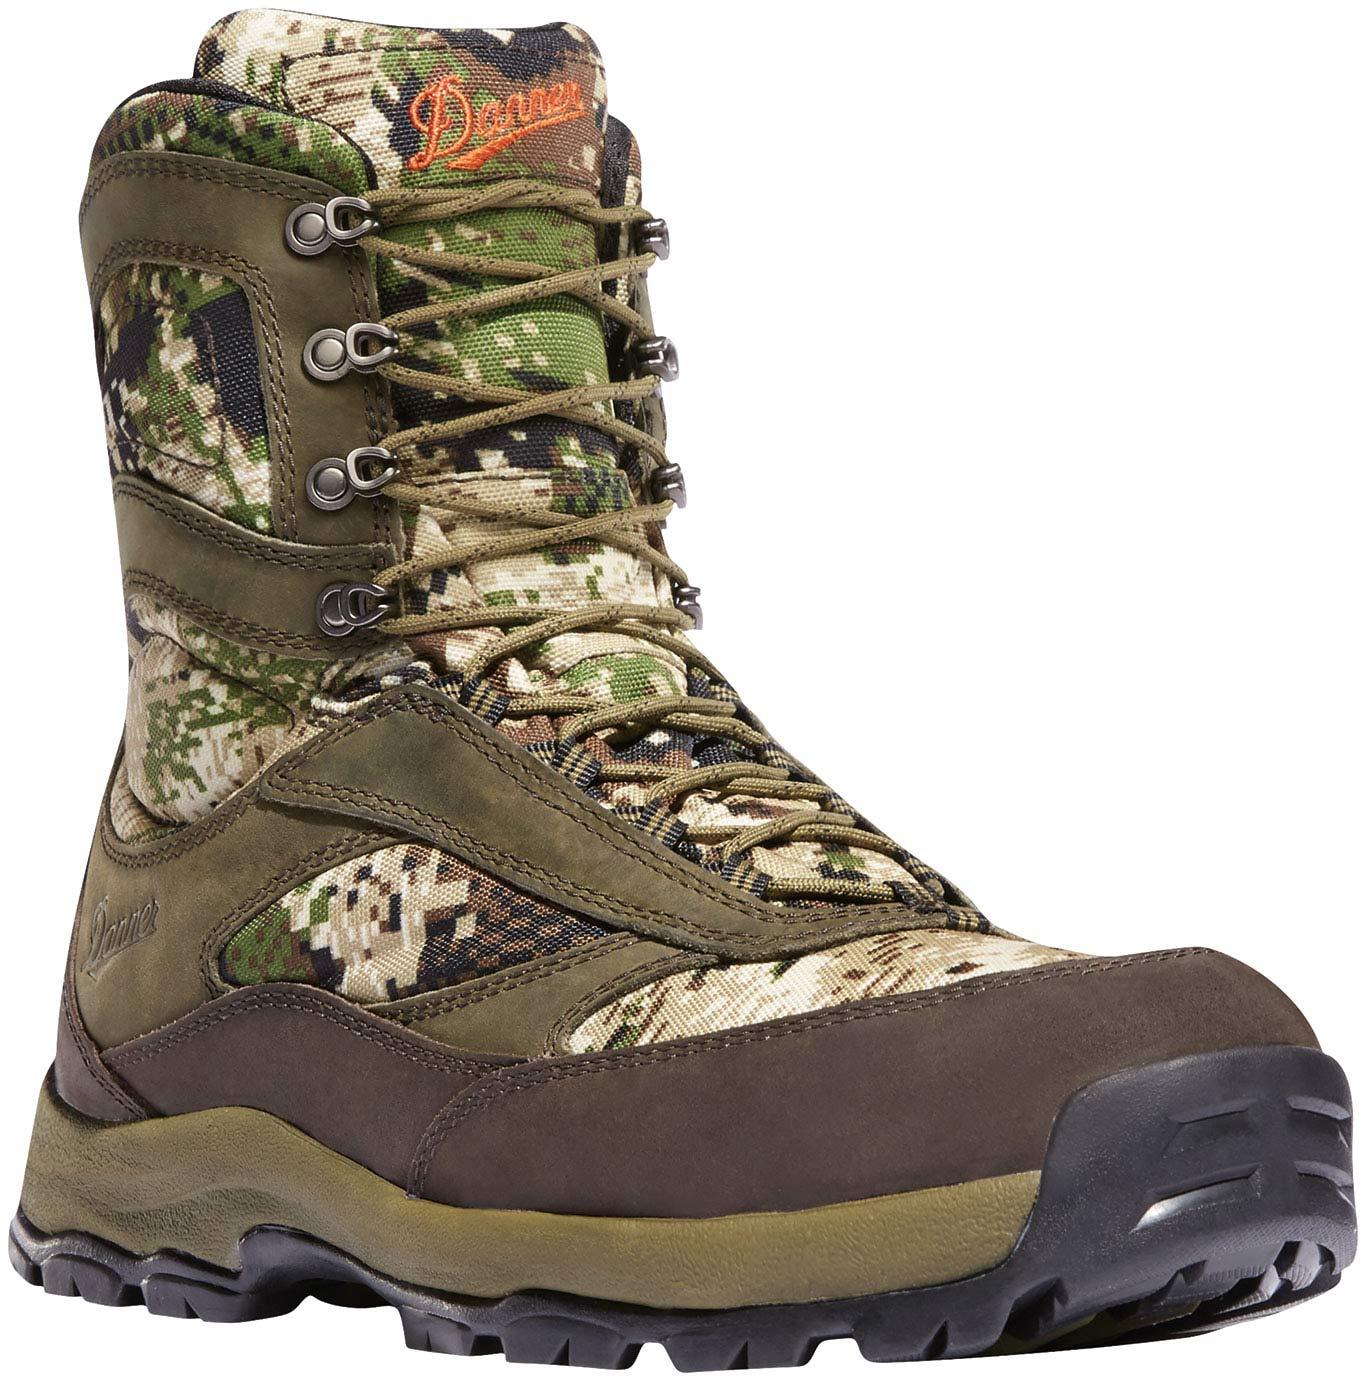 Danner High Ground Boots